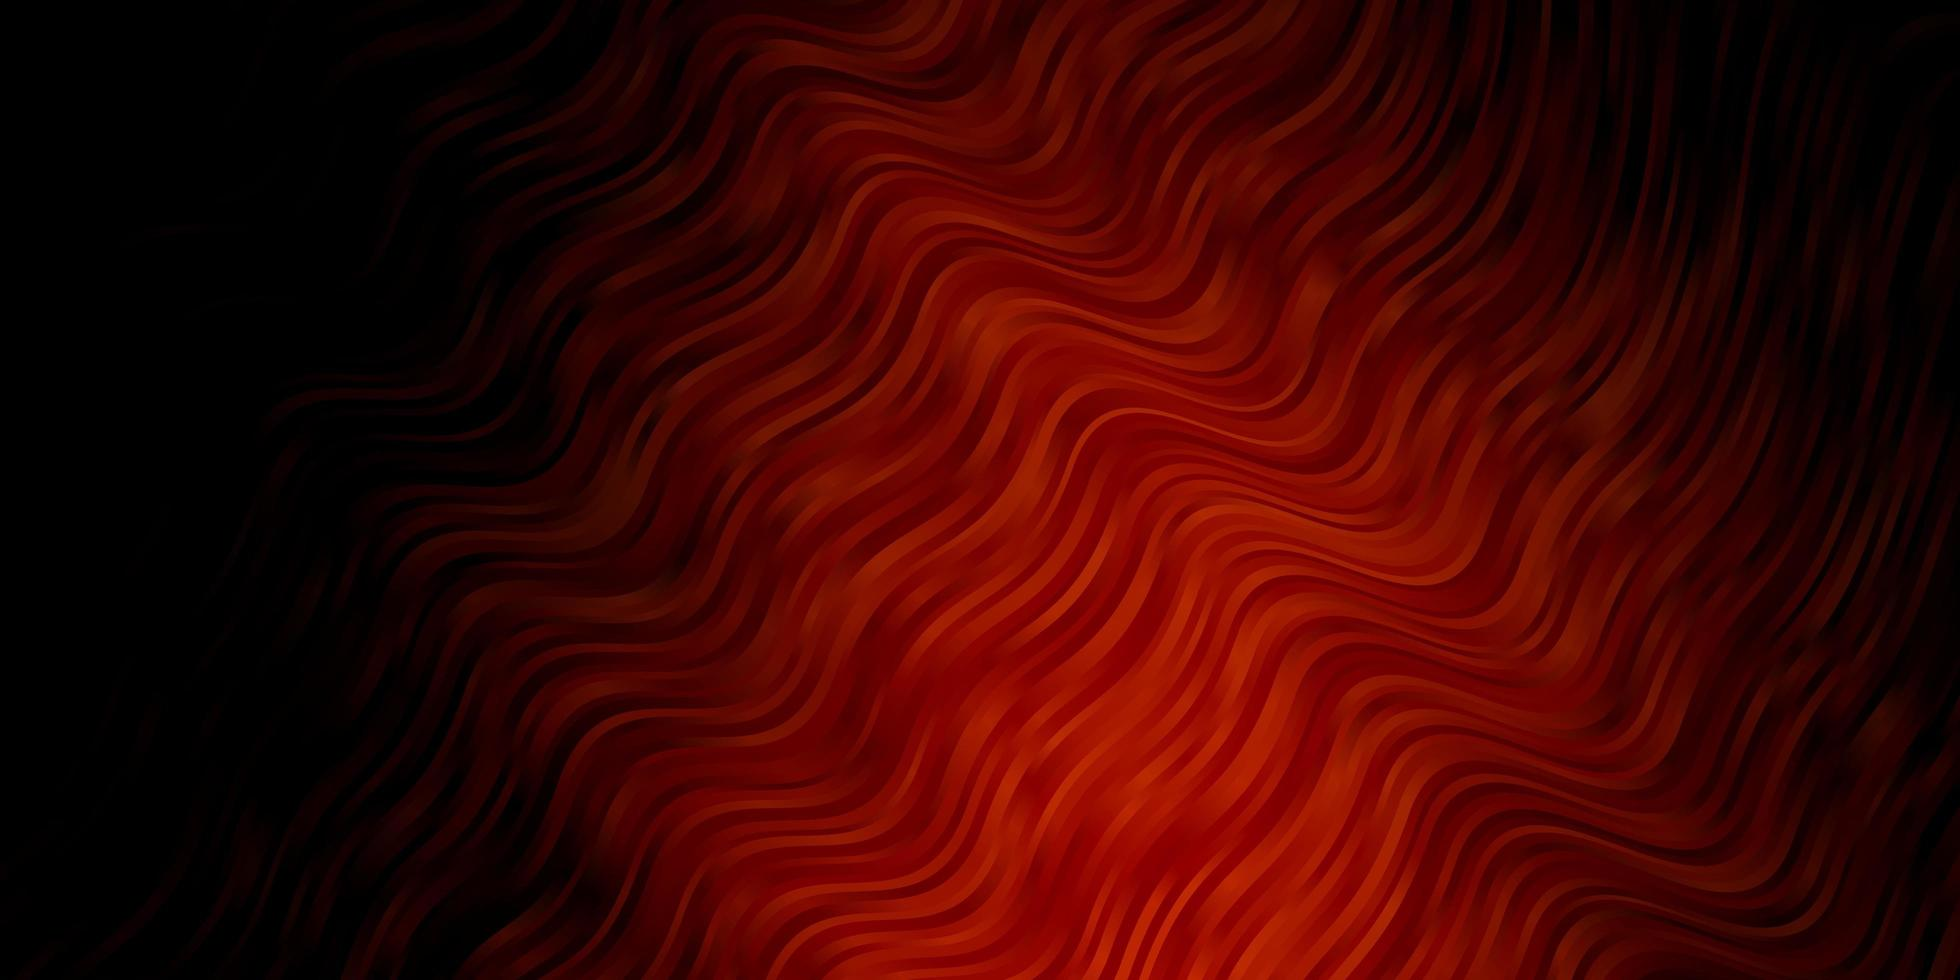 dunkelrotes Vektorlayout mit Kurven. vektor